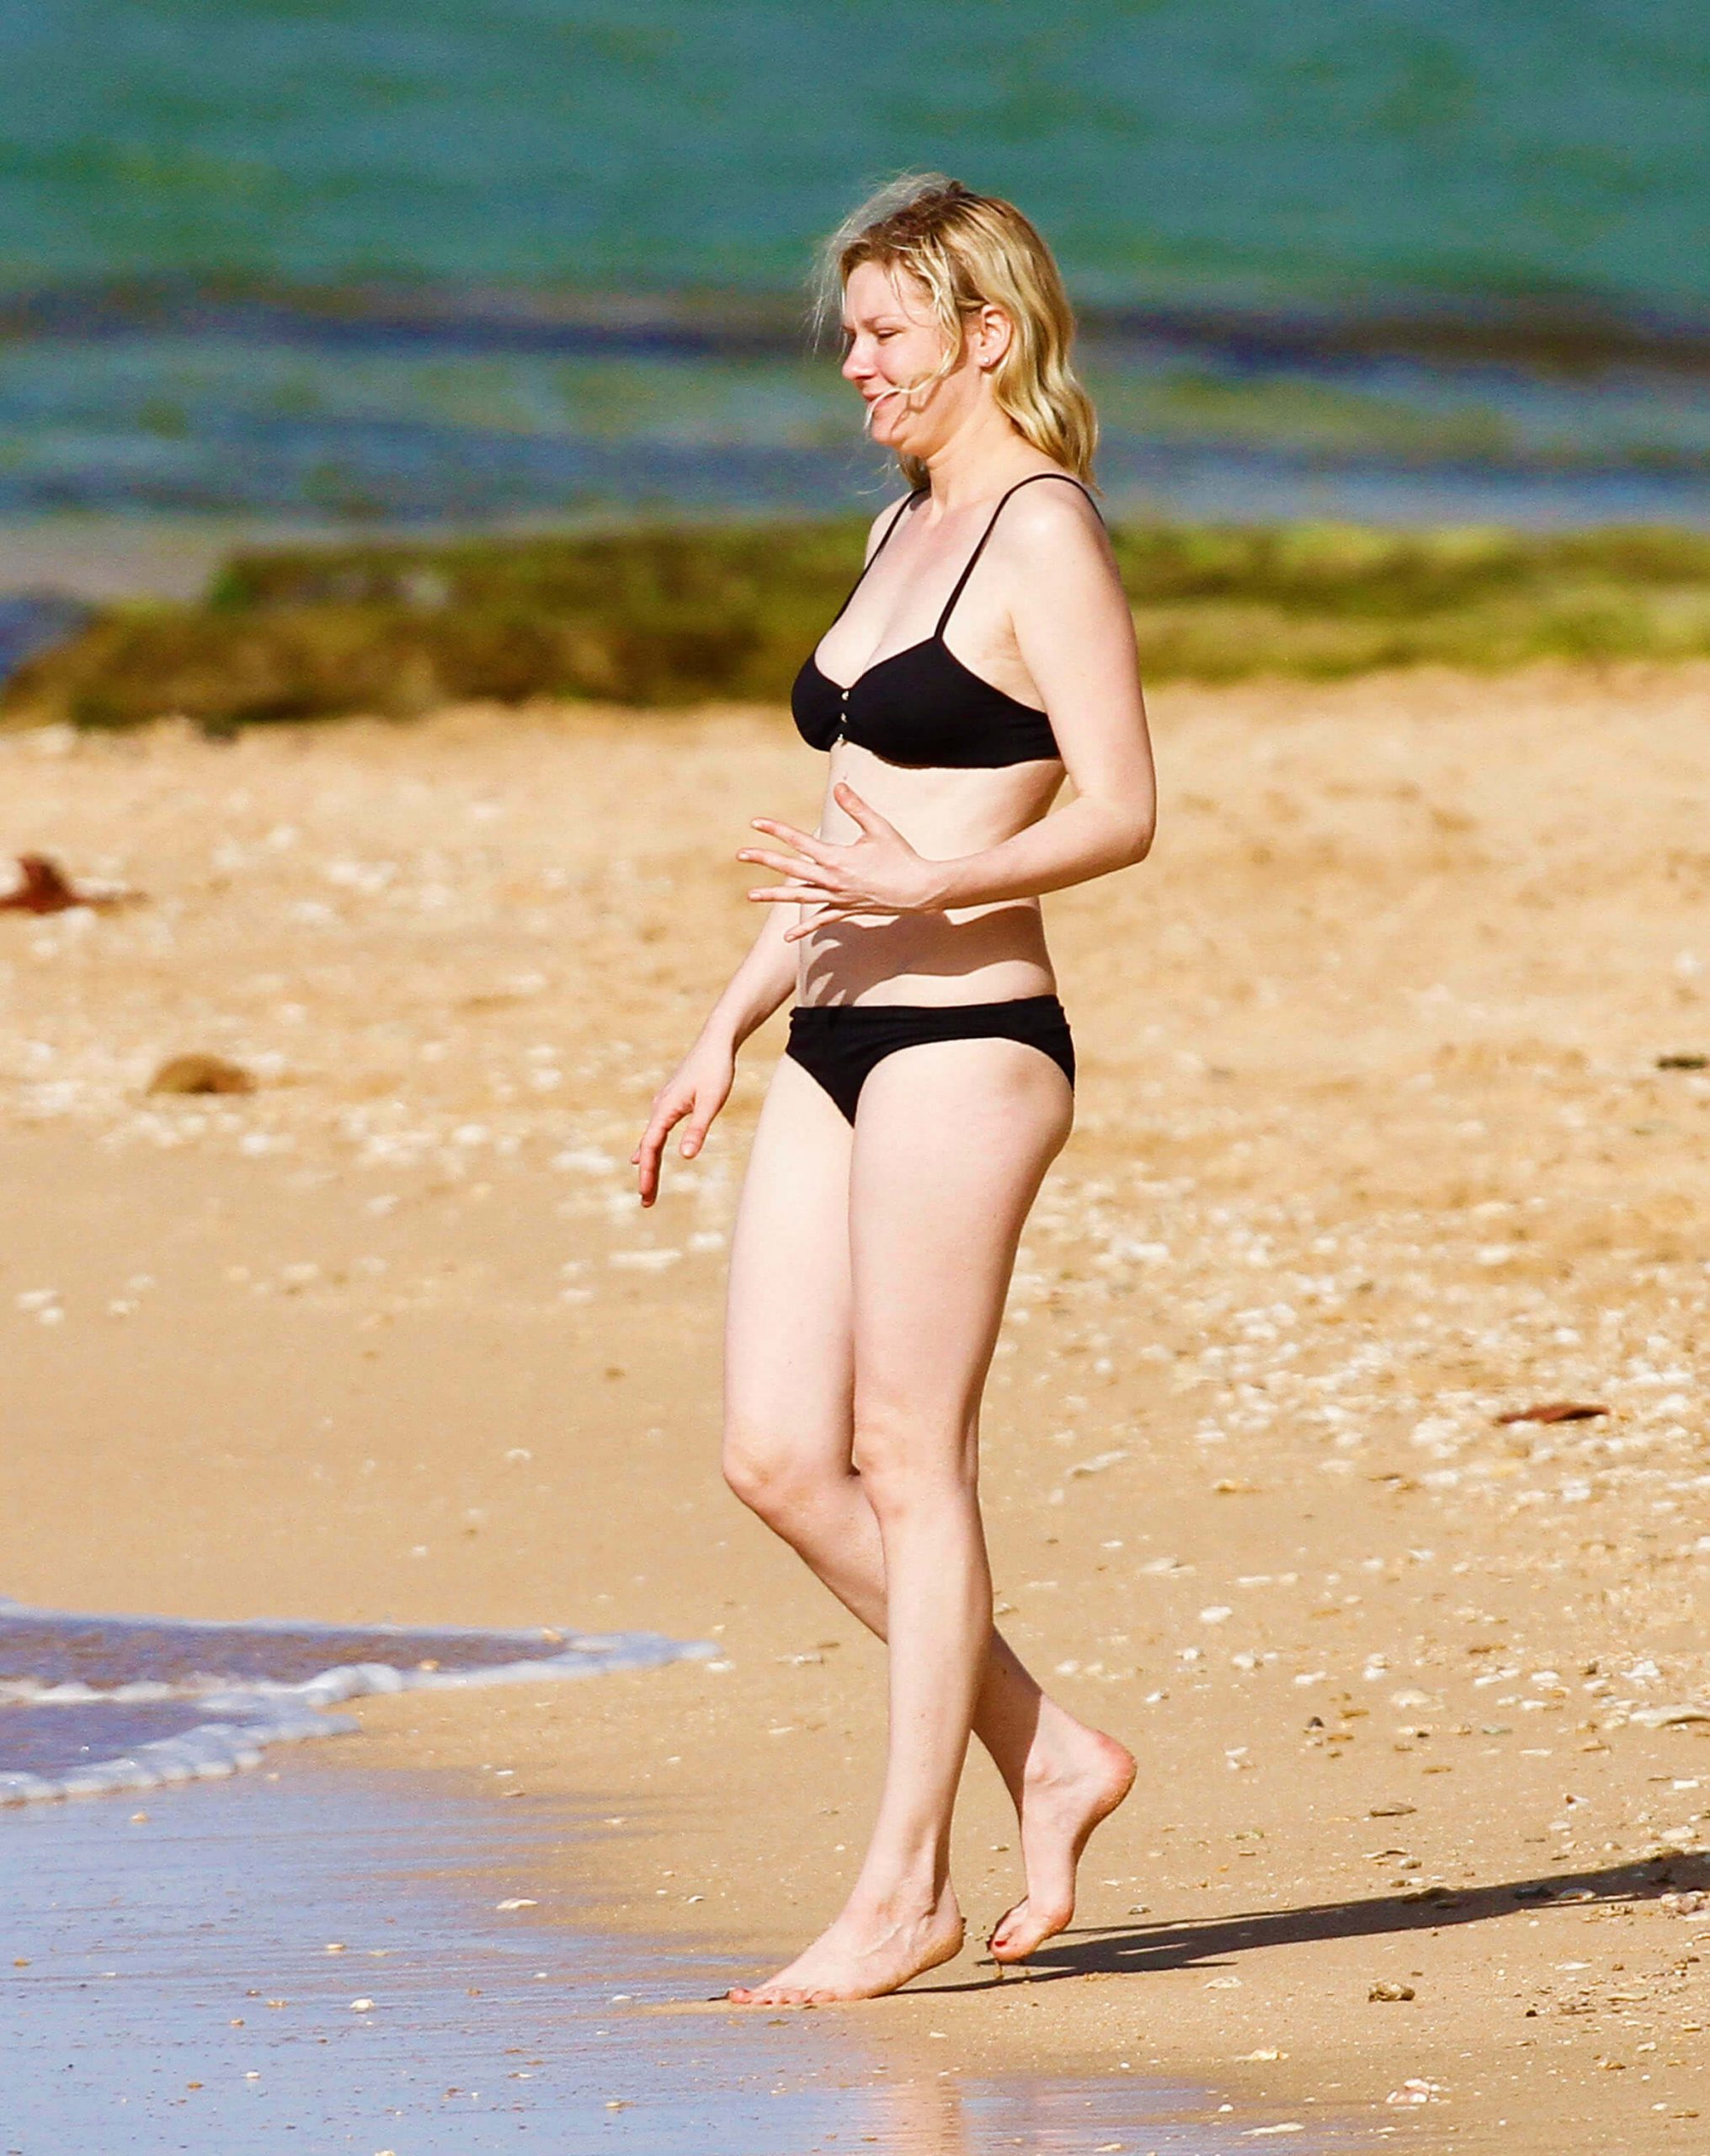 Kirsten Dunst hot bikini pics